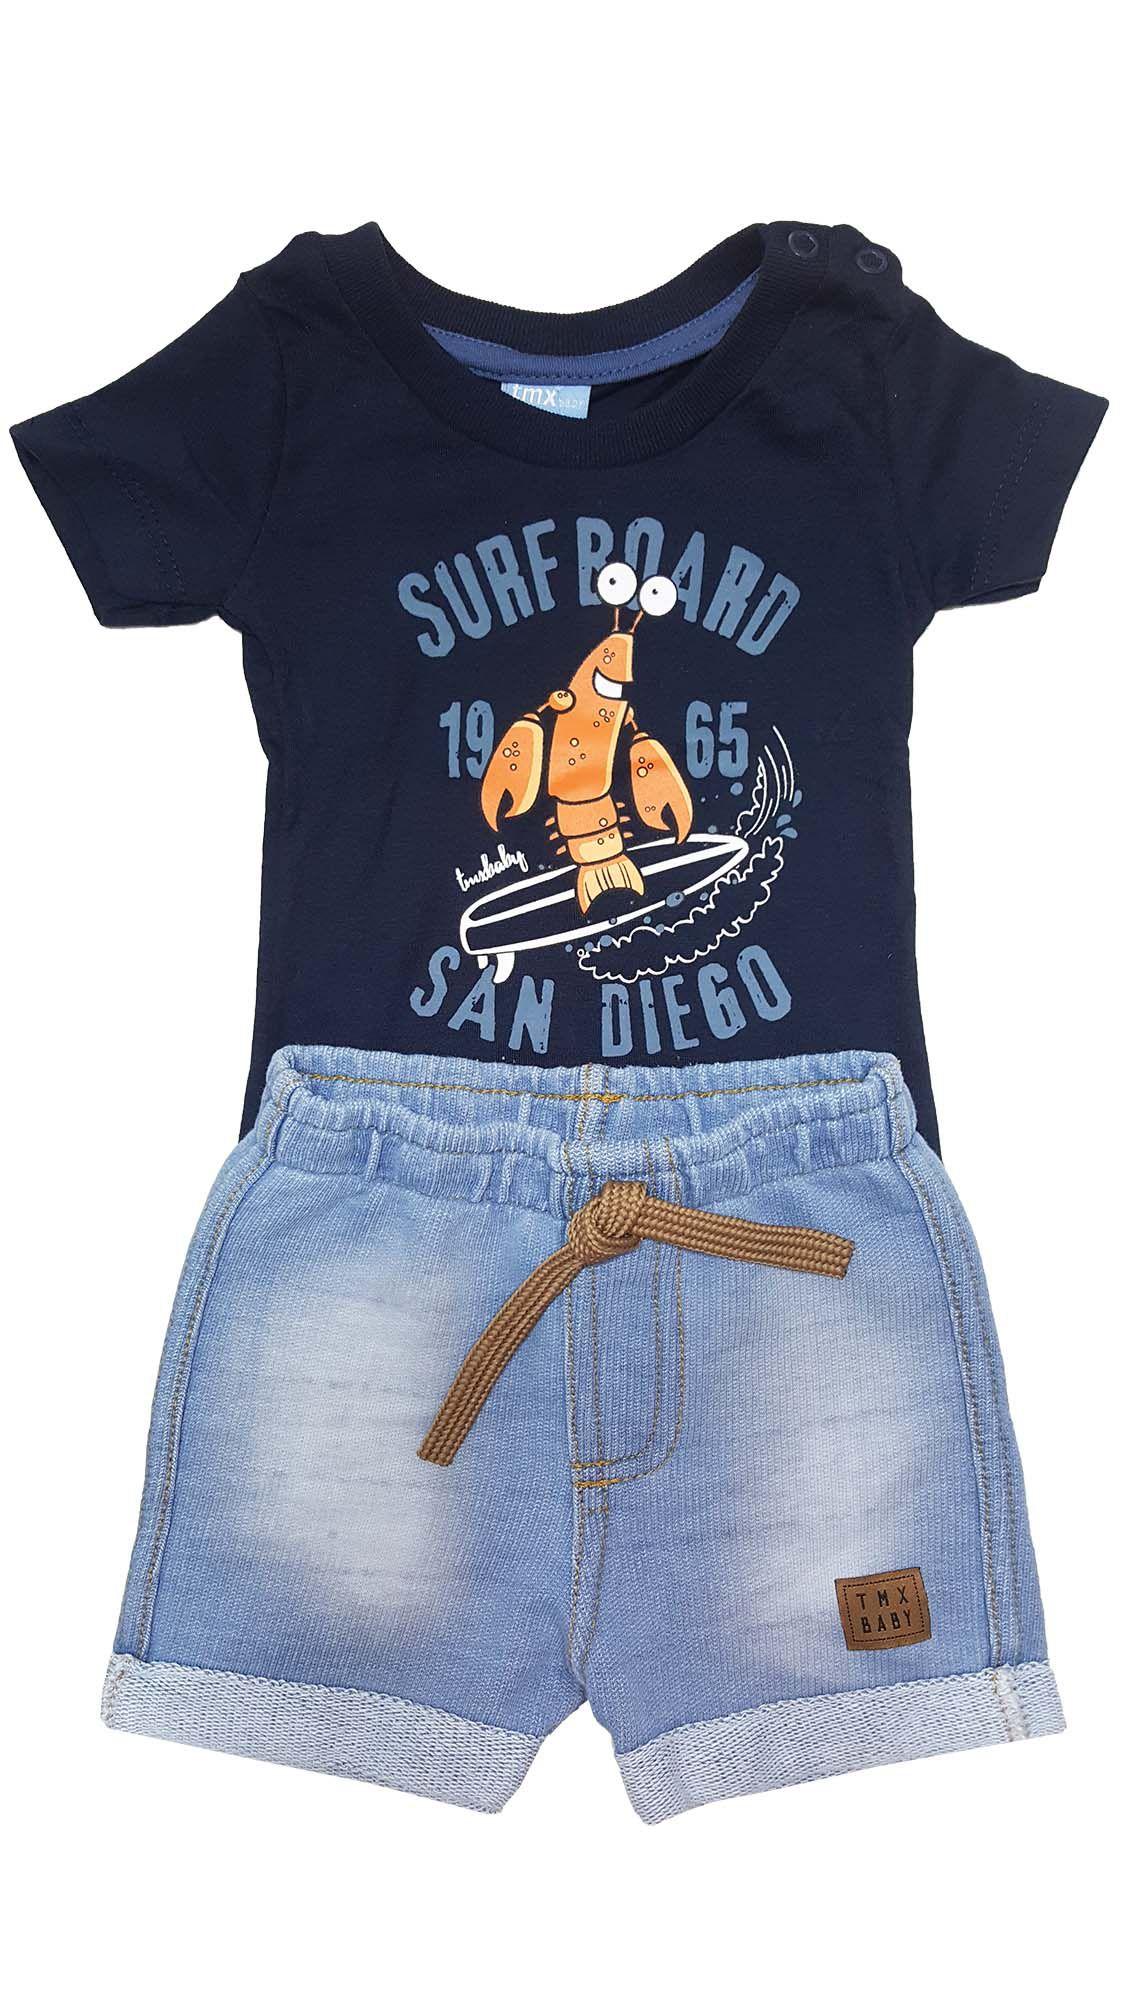 Conjunto Bebê Camiseta e Bermuda Moletom Jeans  TMX  Surf Board Marinho